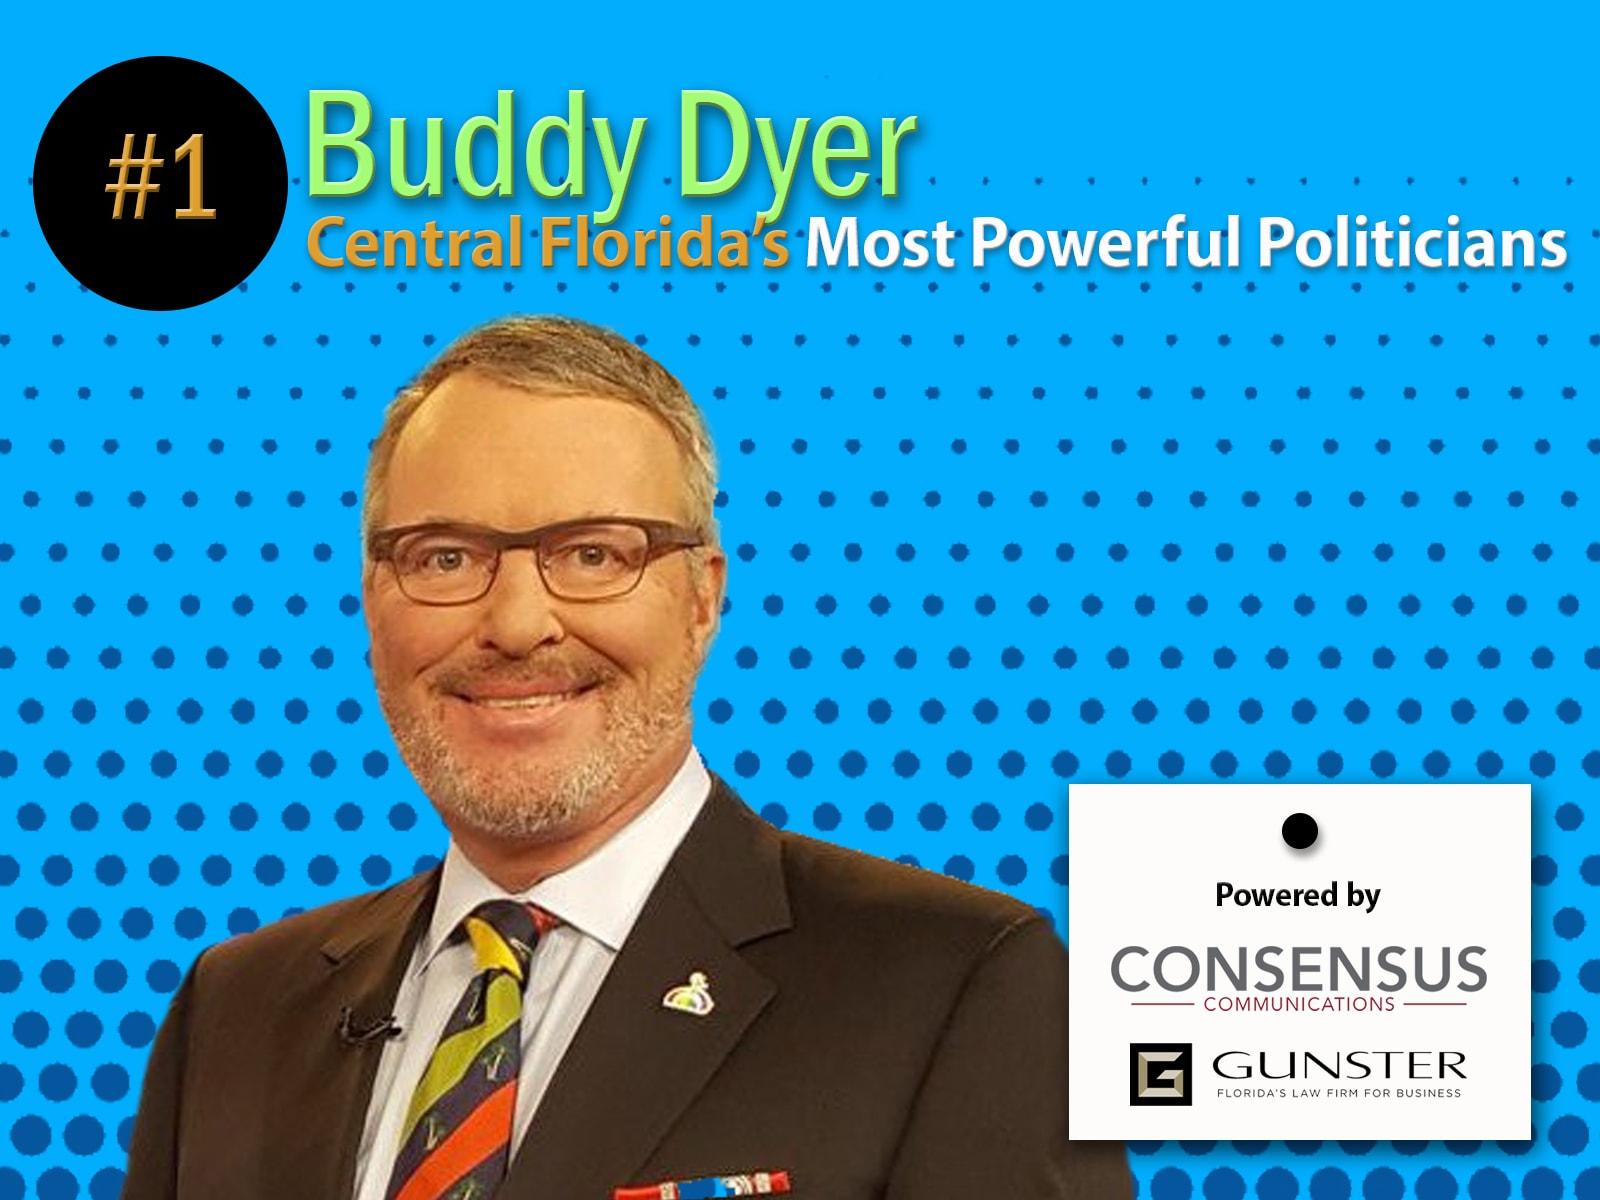 Buddy-Dyer-UPDATE.jpg